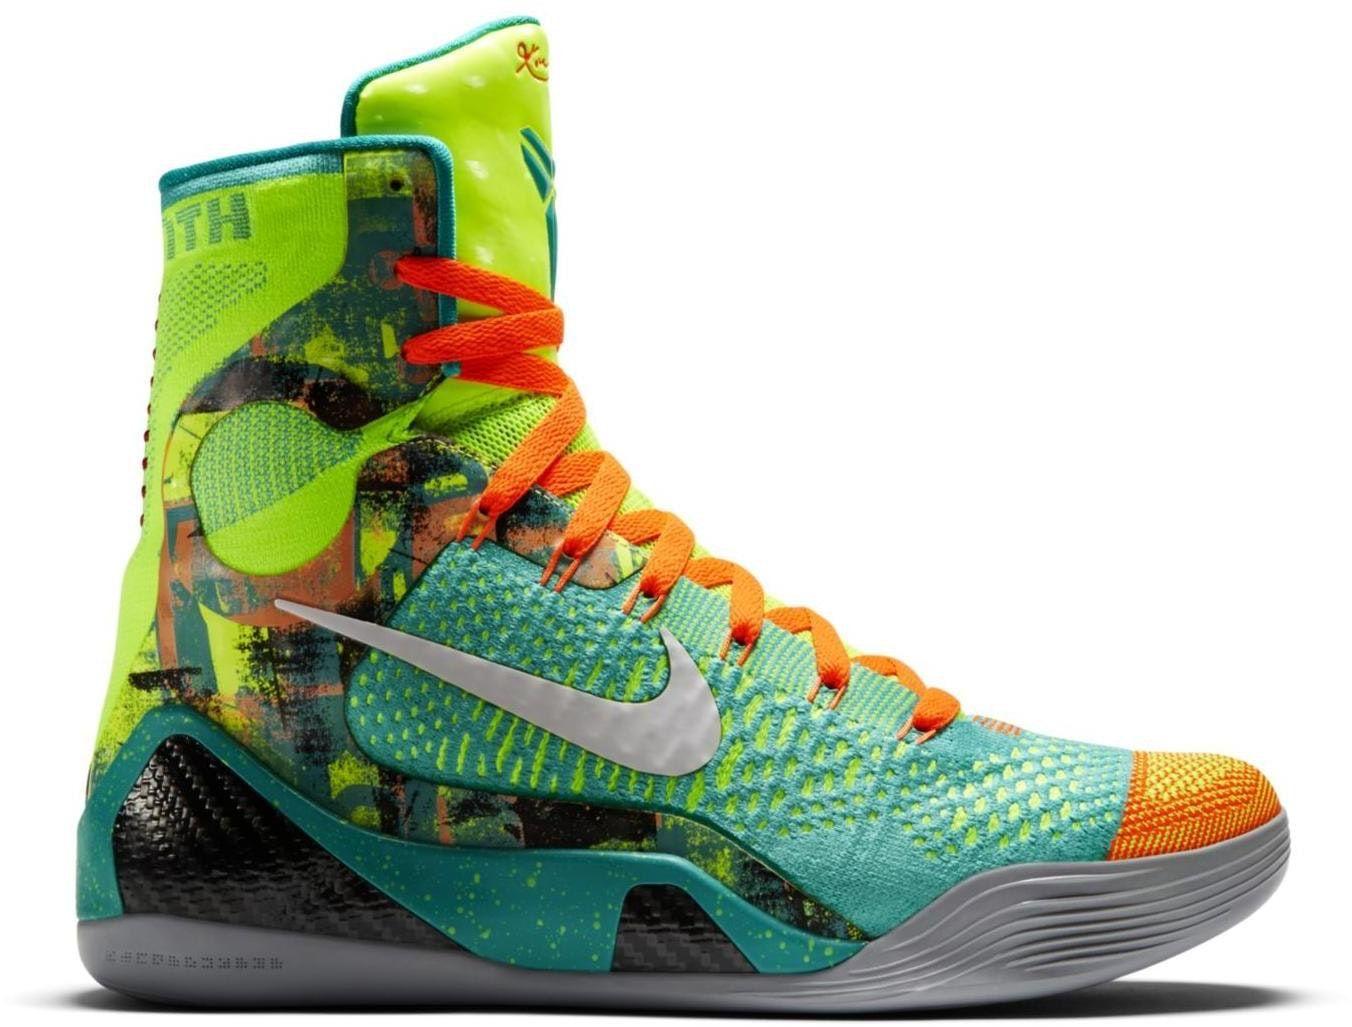 Nike Kobe 9 Elite Influence | Kobe 9